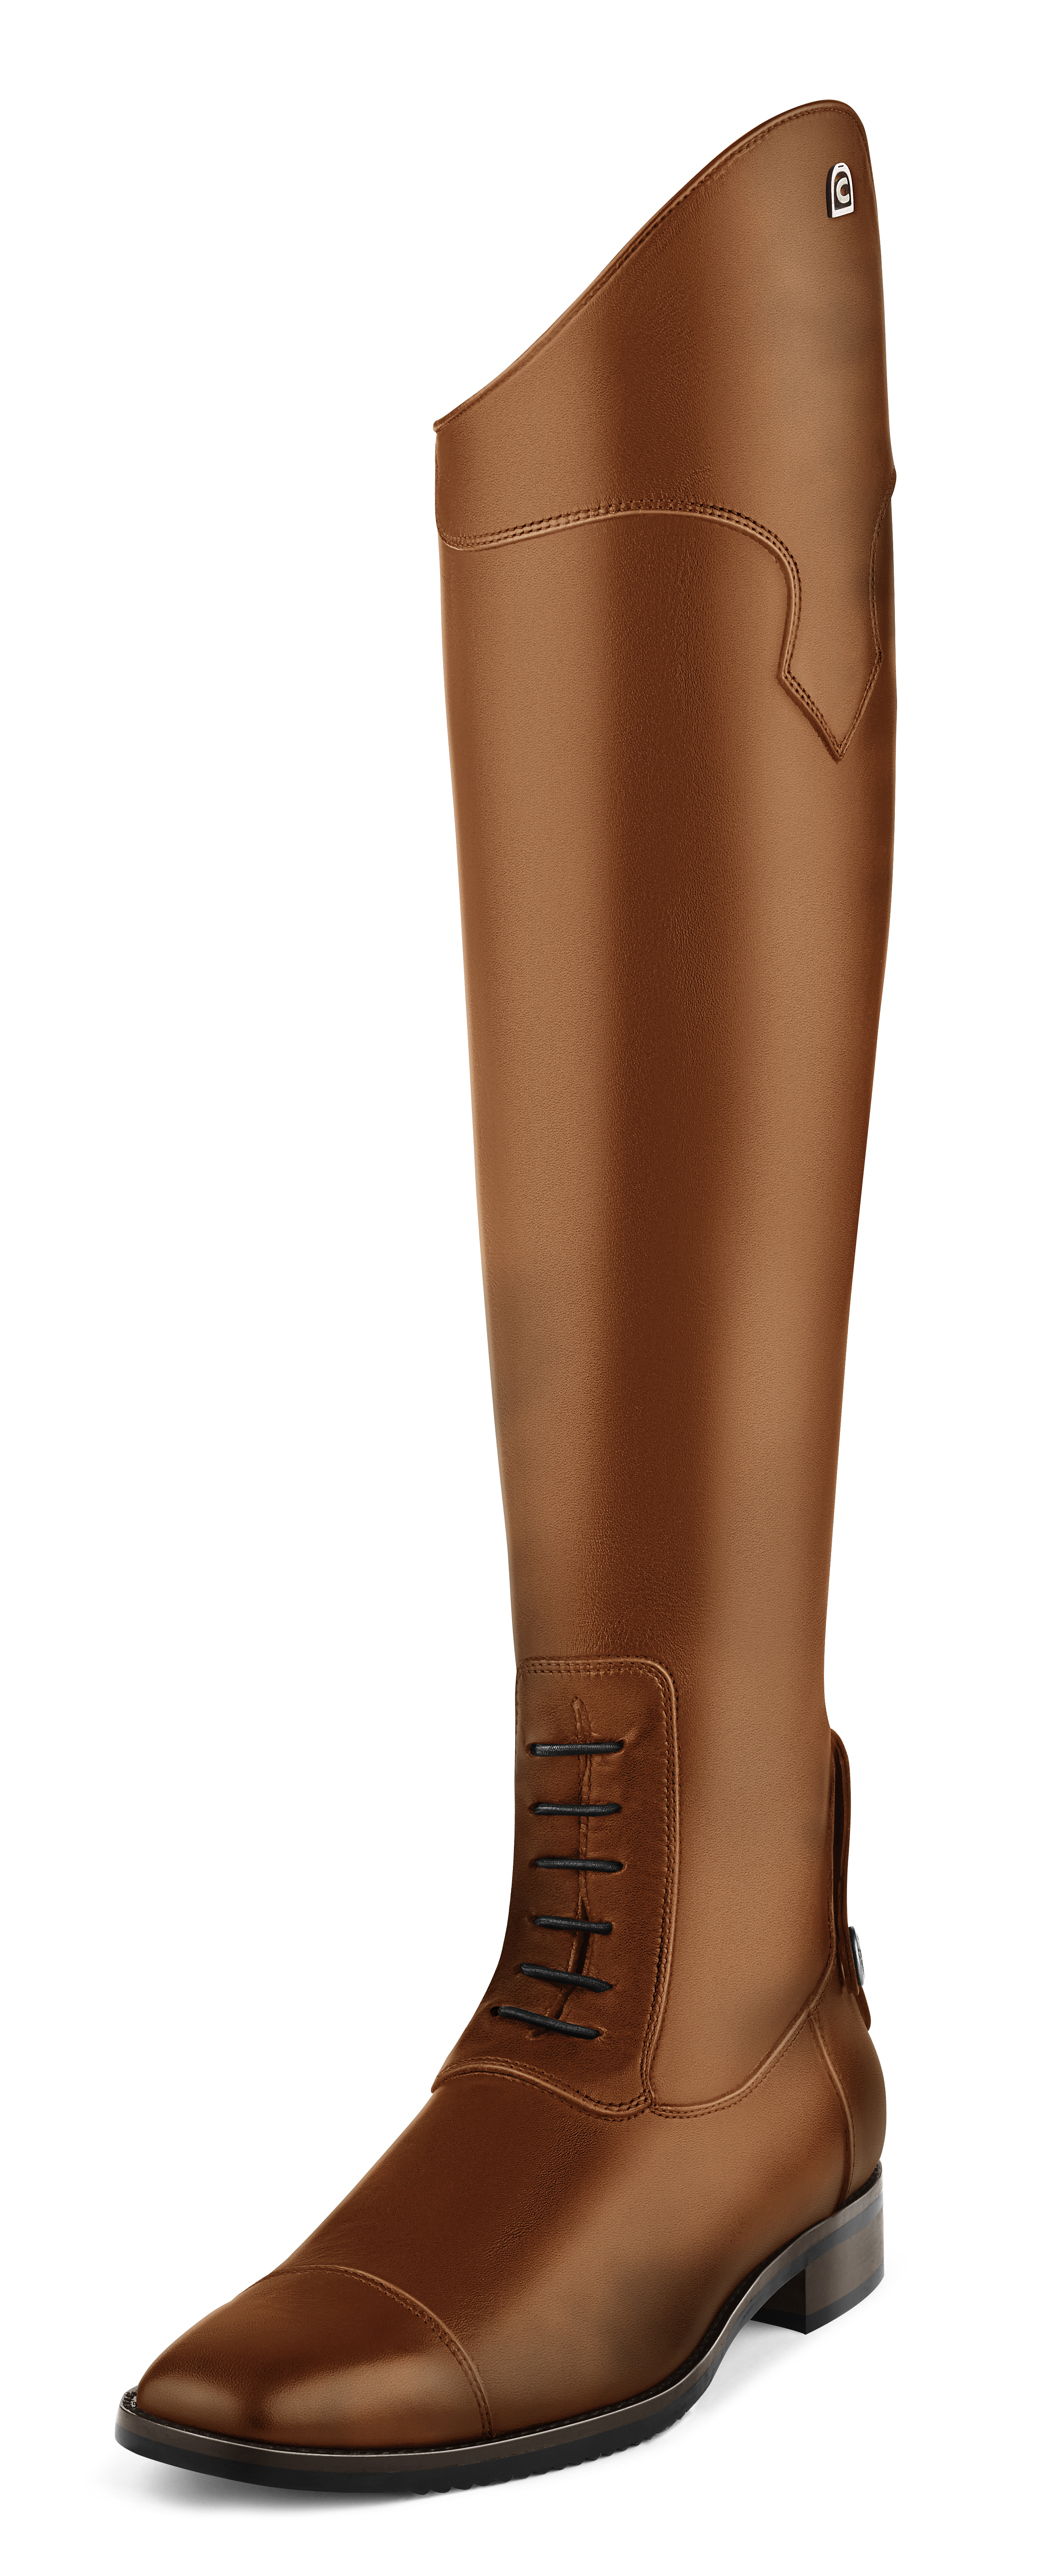 Cavallo stiefel. Cavallo Stiefel Größe 39 (Süderbrarup